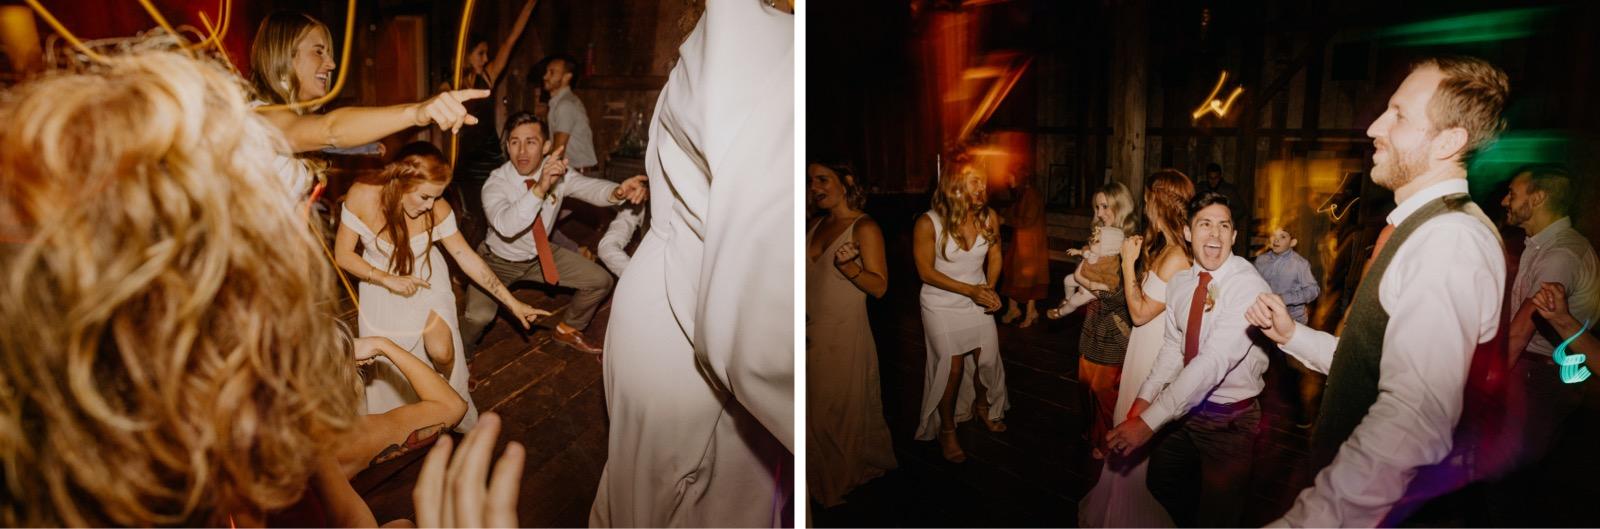 133_Emily & Jeff Wedding 1152_Emily & Jeff Wedding 1149_the-waterfall-lodge_forest_wedding_ben-lomond_intimate